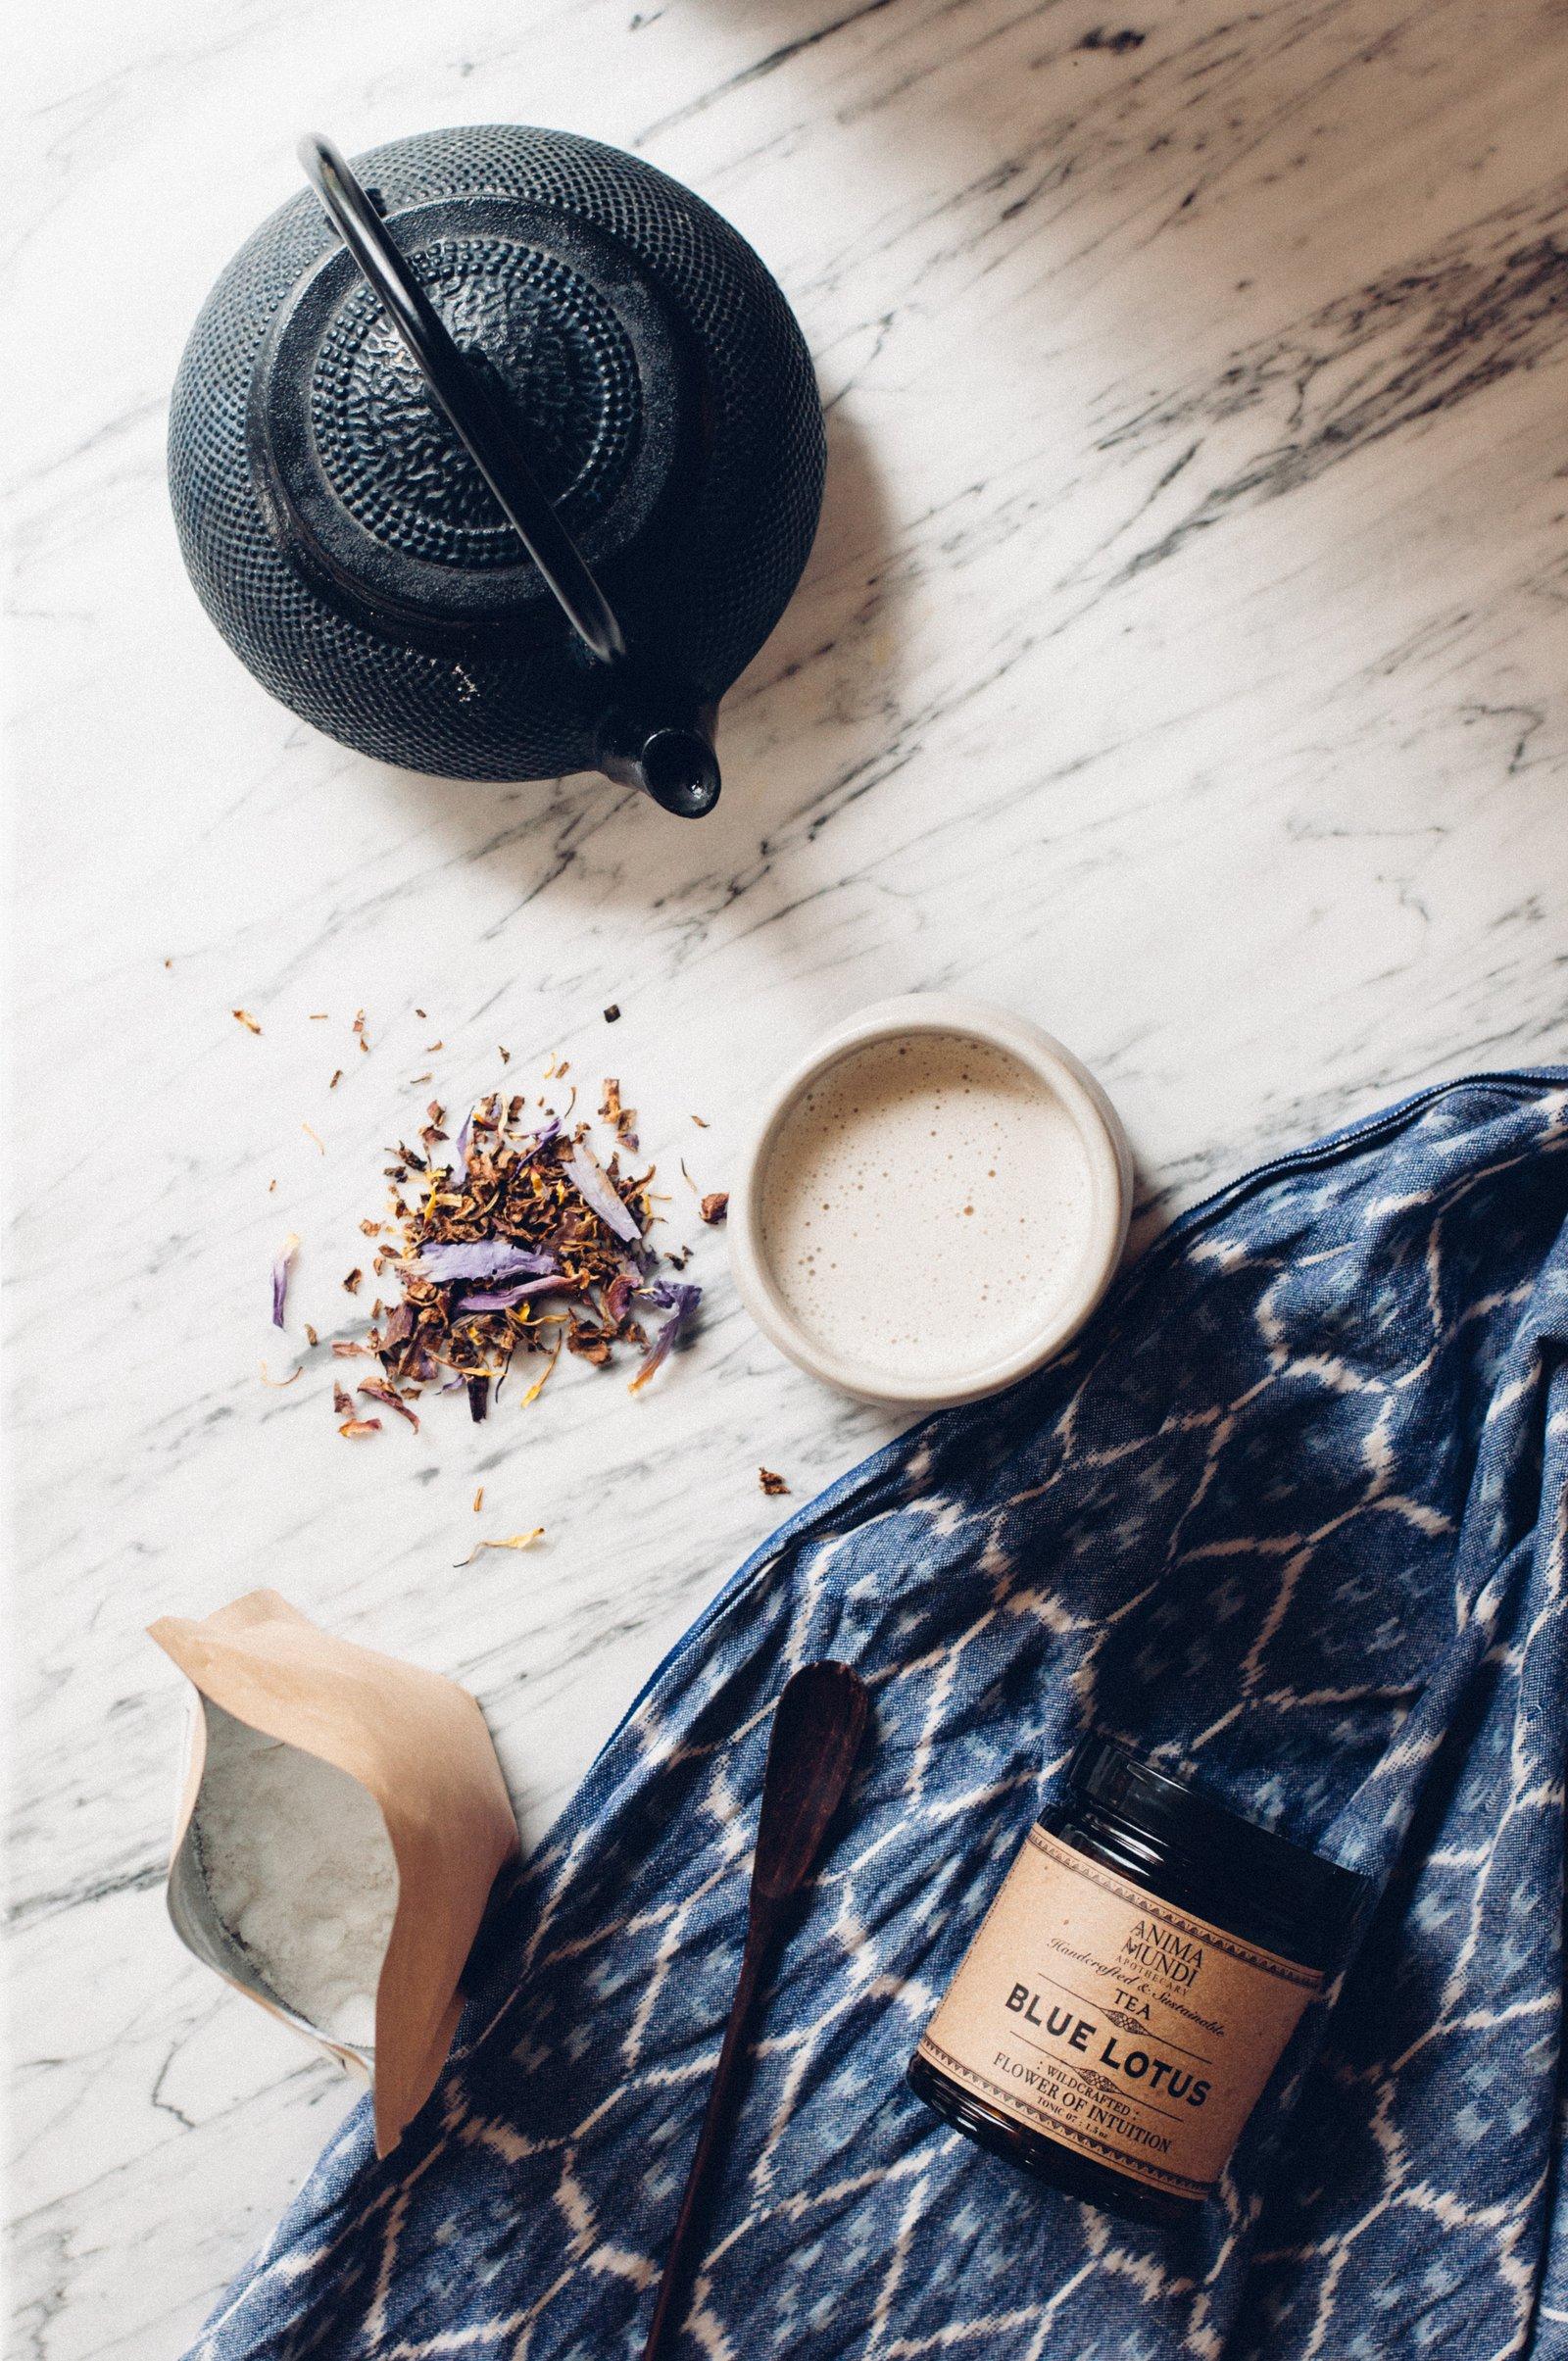 Caeleste Beauty Anima Mundi Blue Lotus Flower Of Intuition Tea Tonic